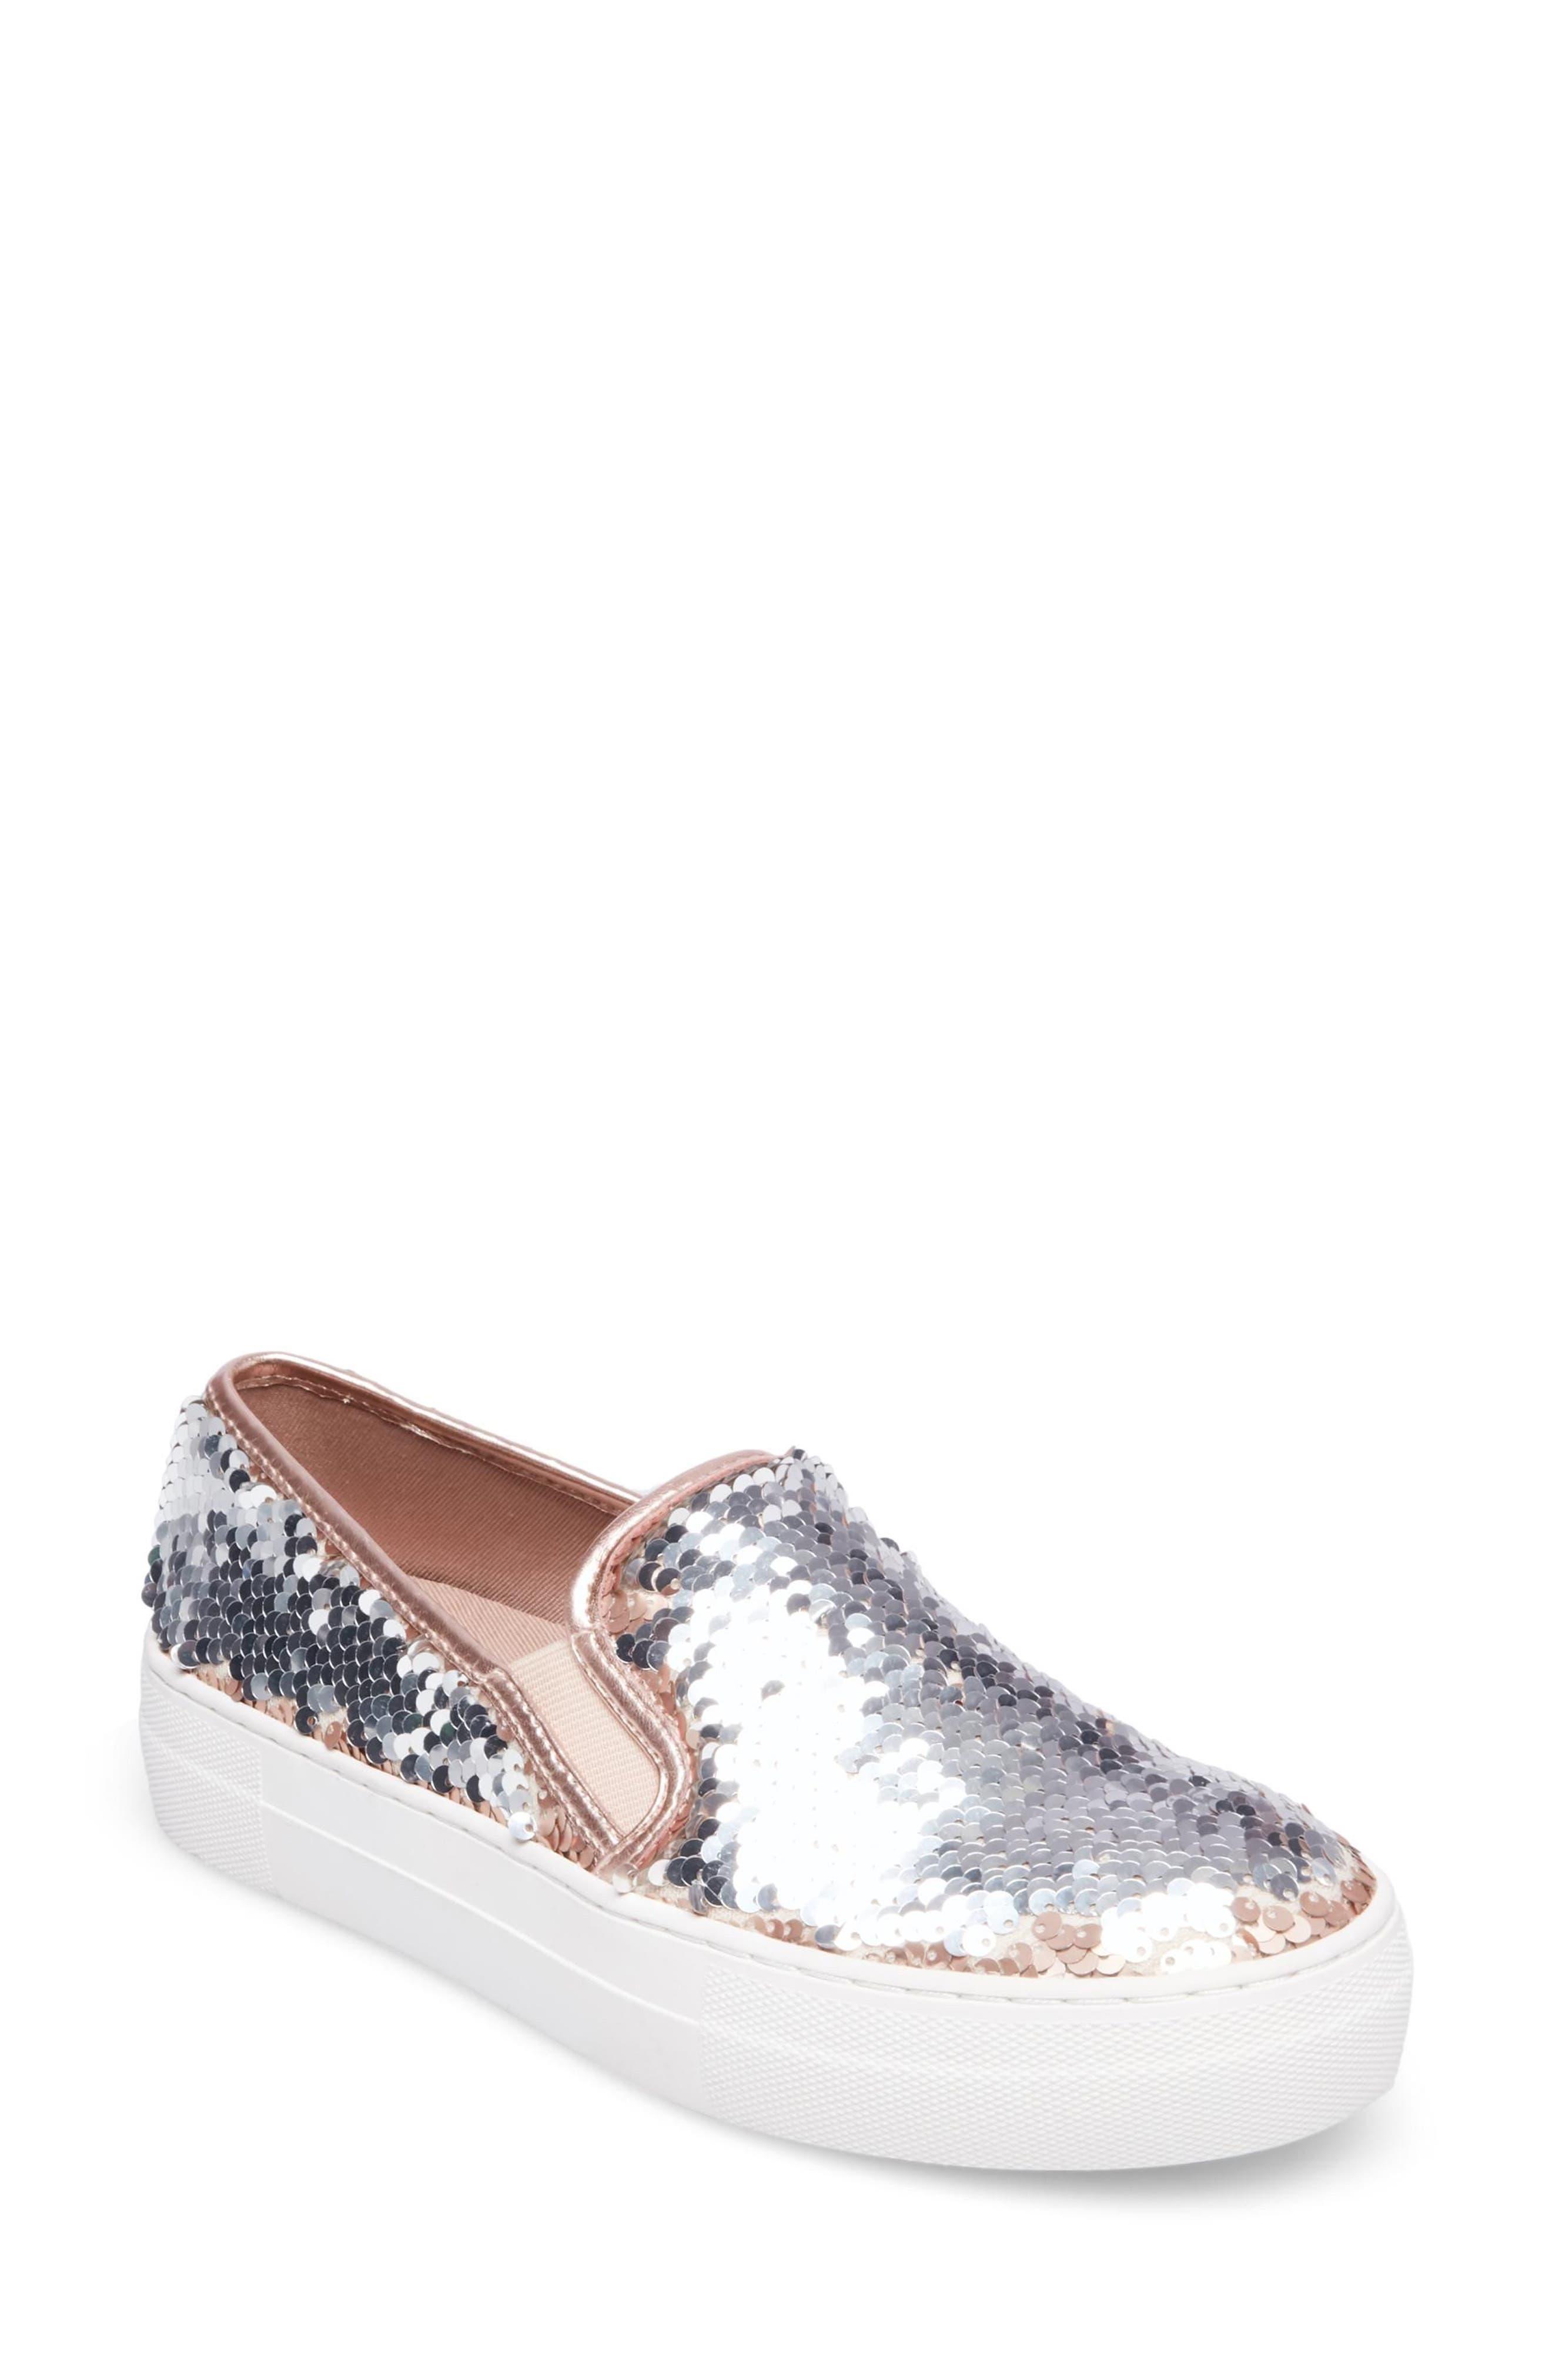 Gills Sequined Slip-On Platform Sneaker,                             Main thumbnail 2, color,